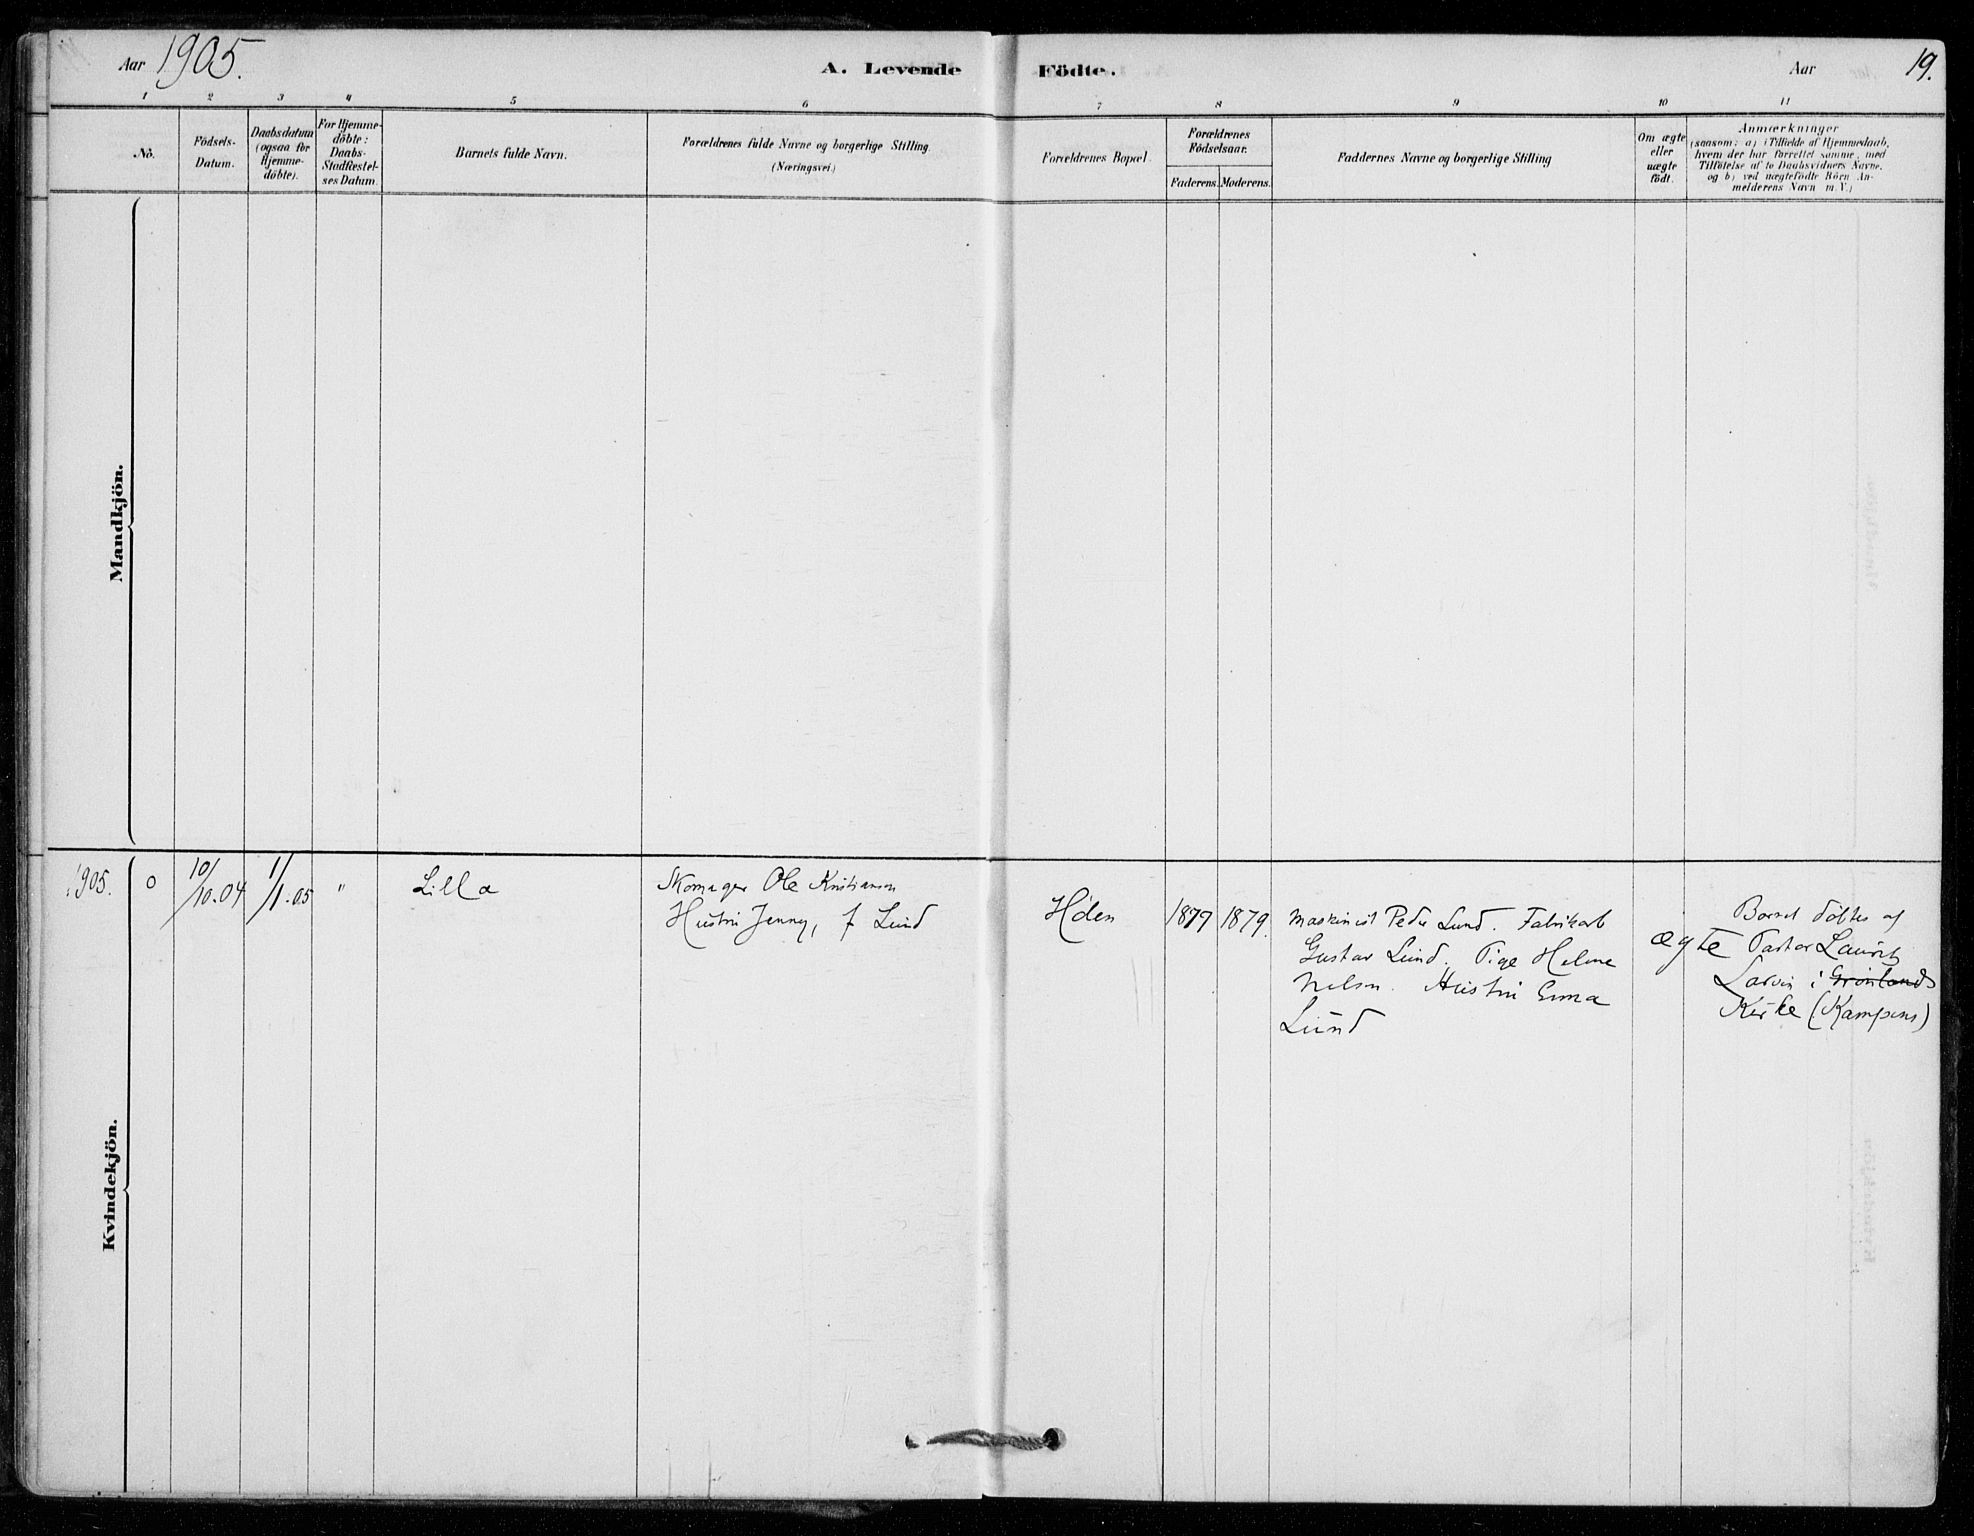 SAO, Vestby prestekontor Kirkebøker, F/Fe/L0001: Ministerialbok nr. V 1, 1878-1931, s. 19